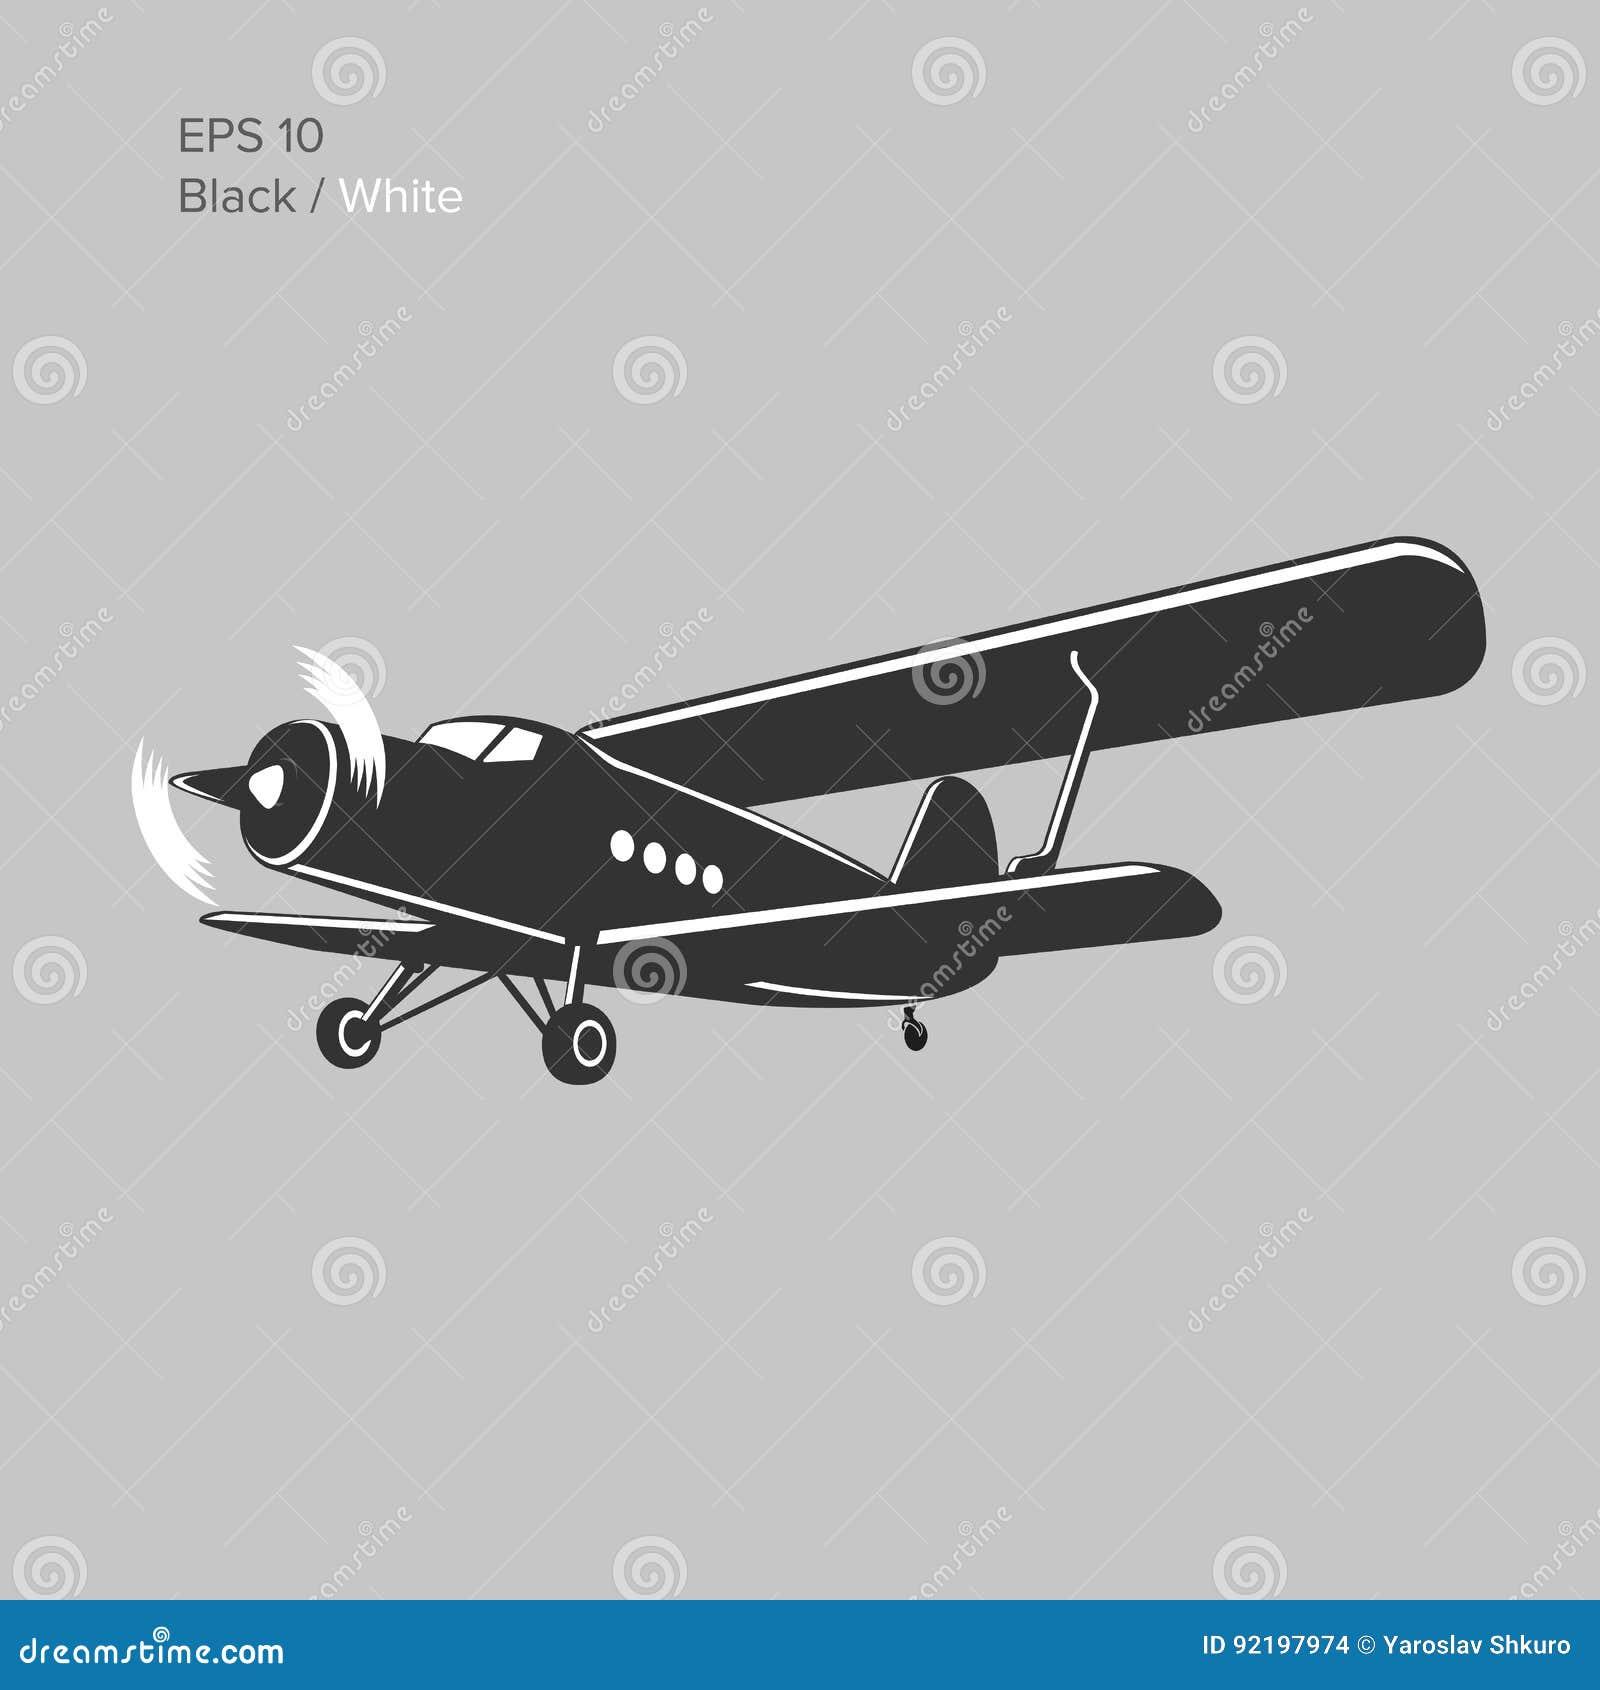 Car With Aeroplane Engine >> Retro Passenger Aircraft. Vector Illustration | CartoonDealer.com #29899430